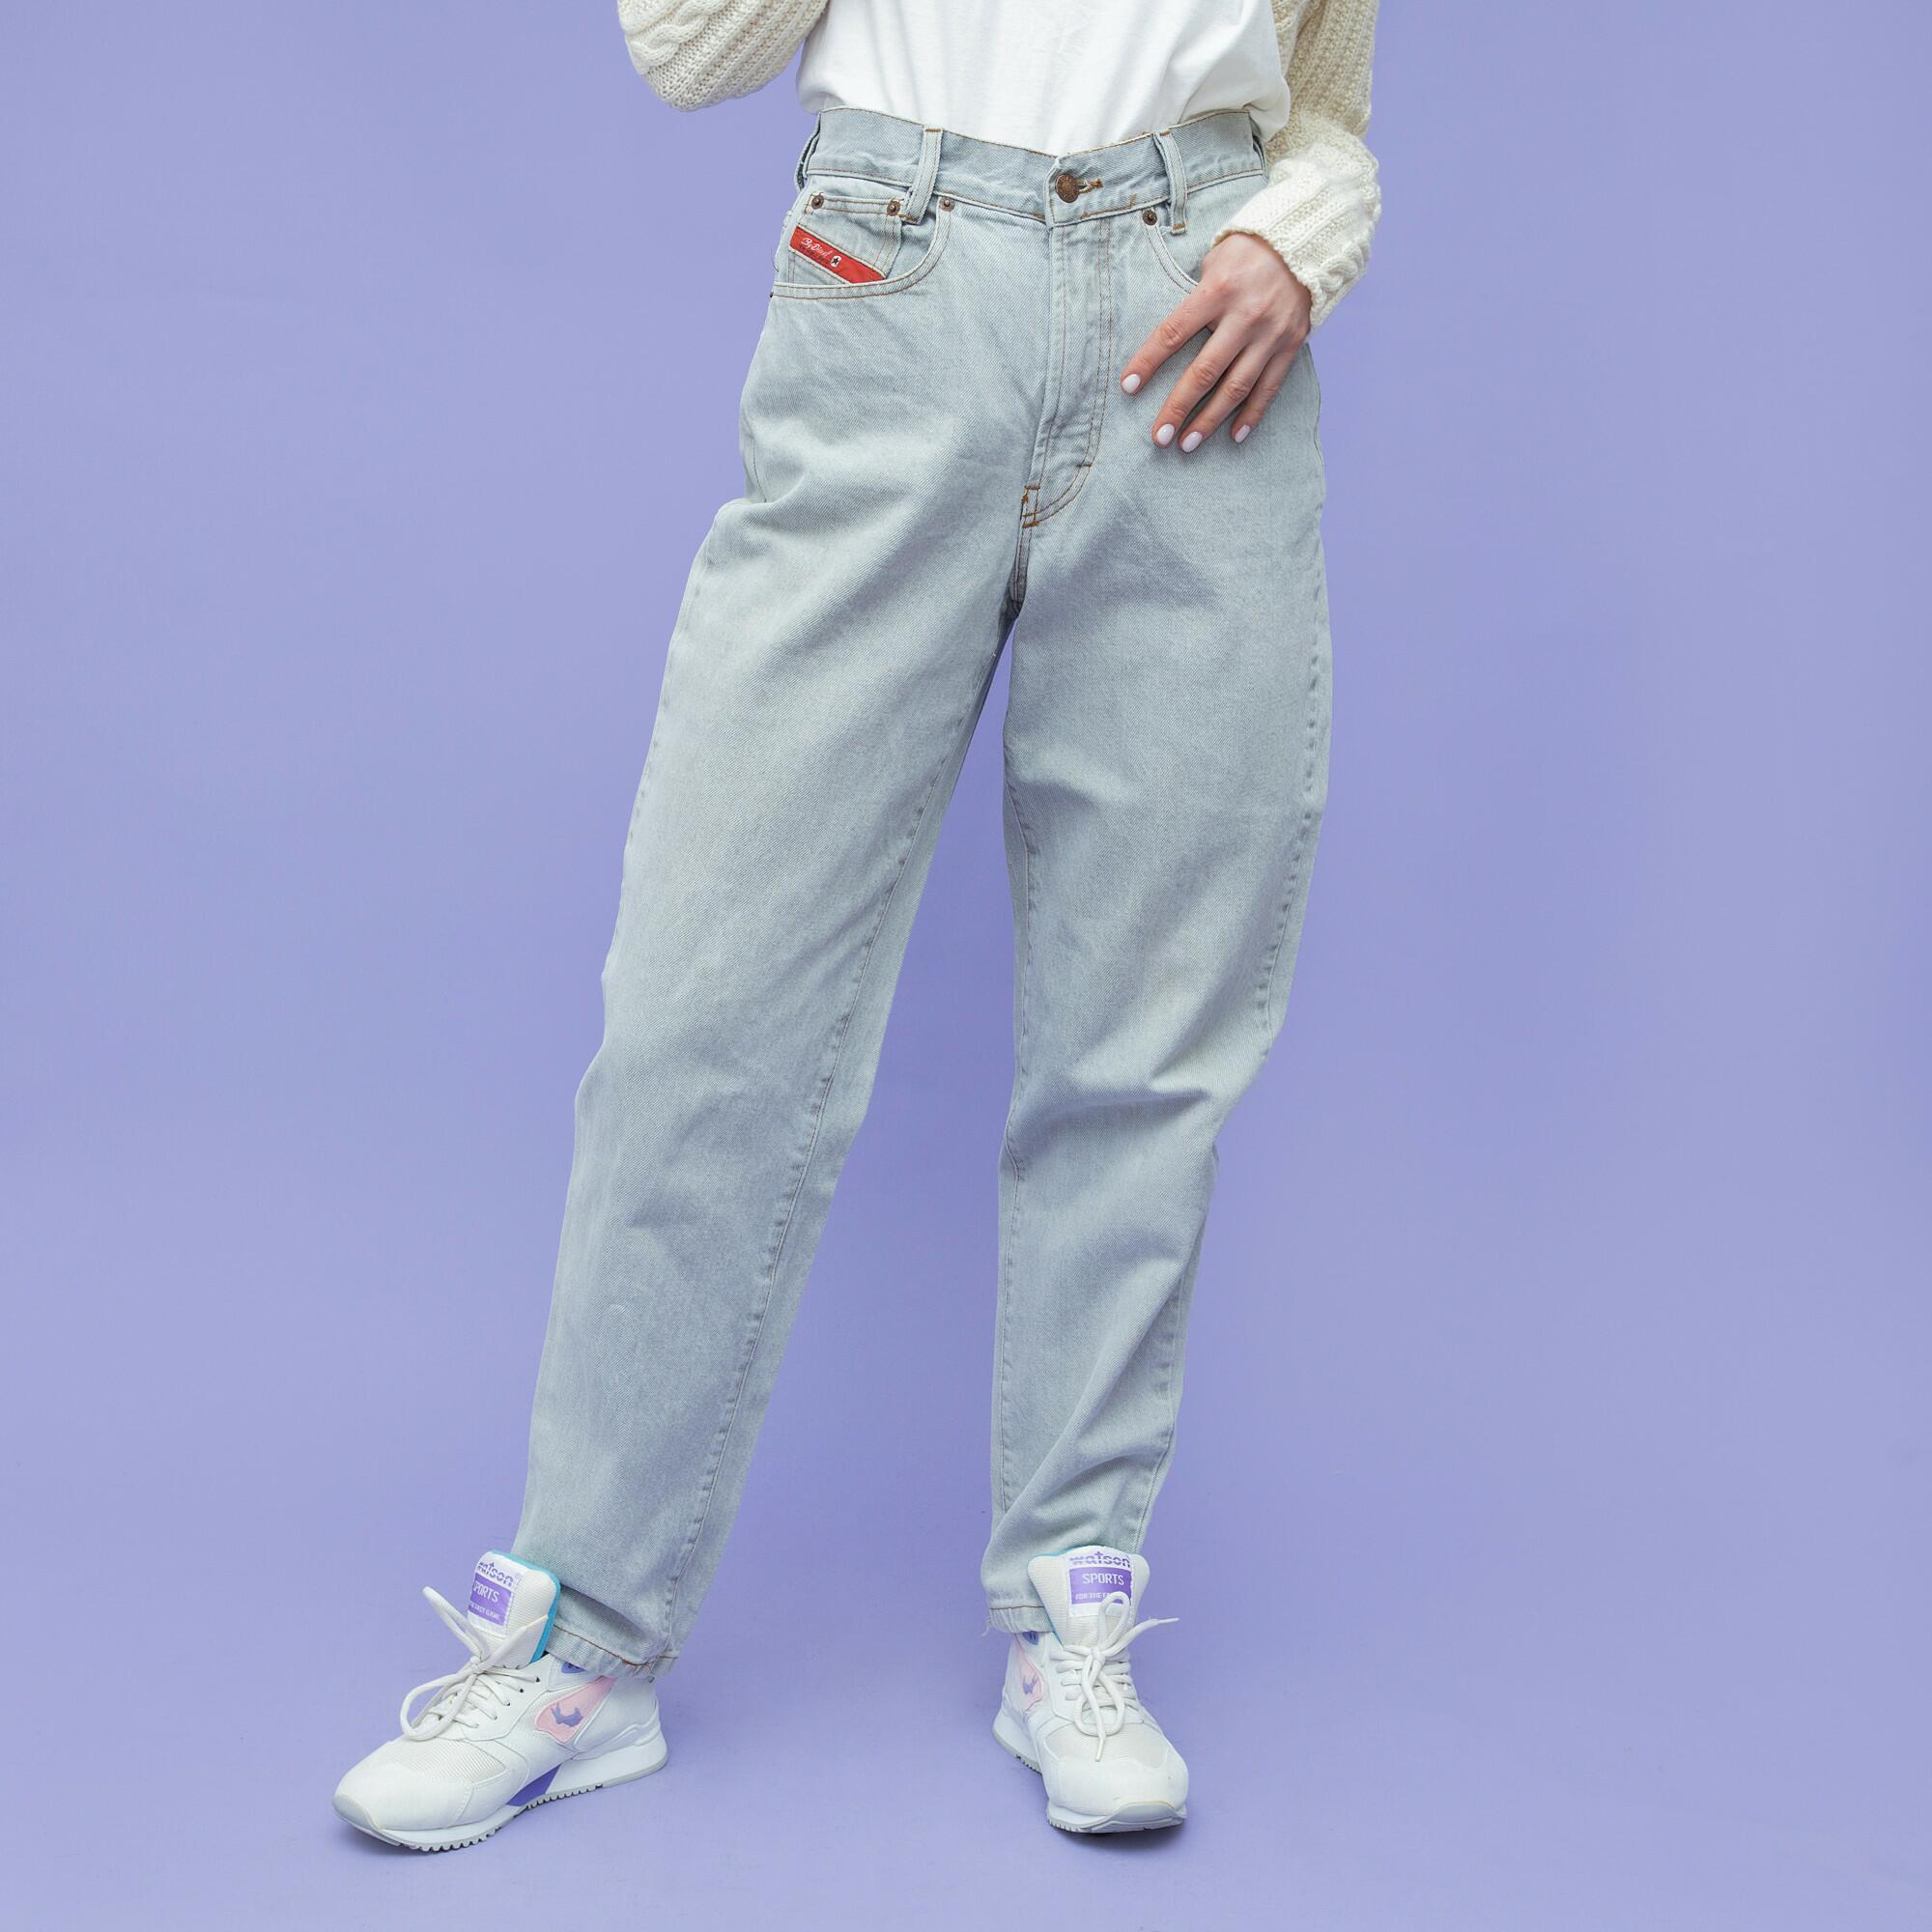 Jeansy jasnoszare marki DIESEL - KEX Vintage Store | JestemSlow.pl